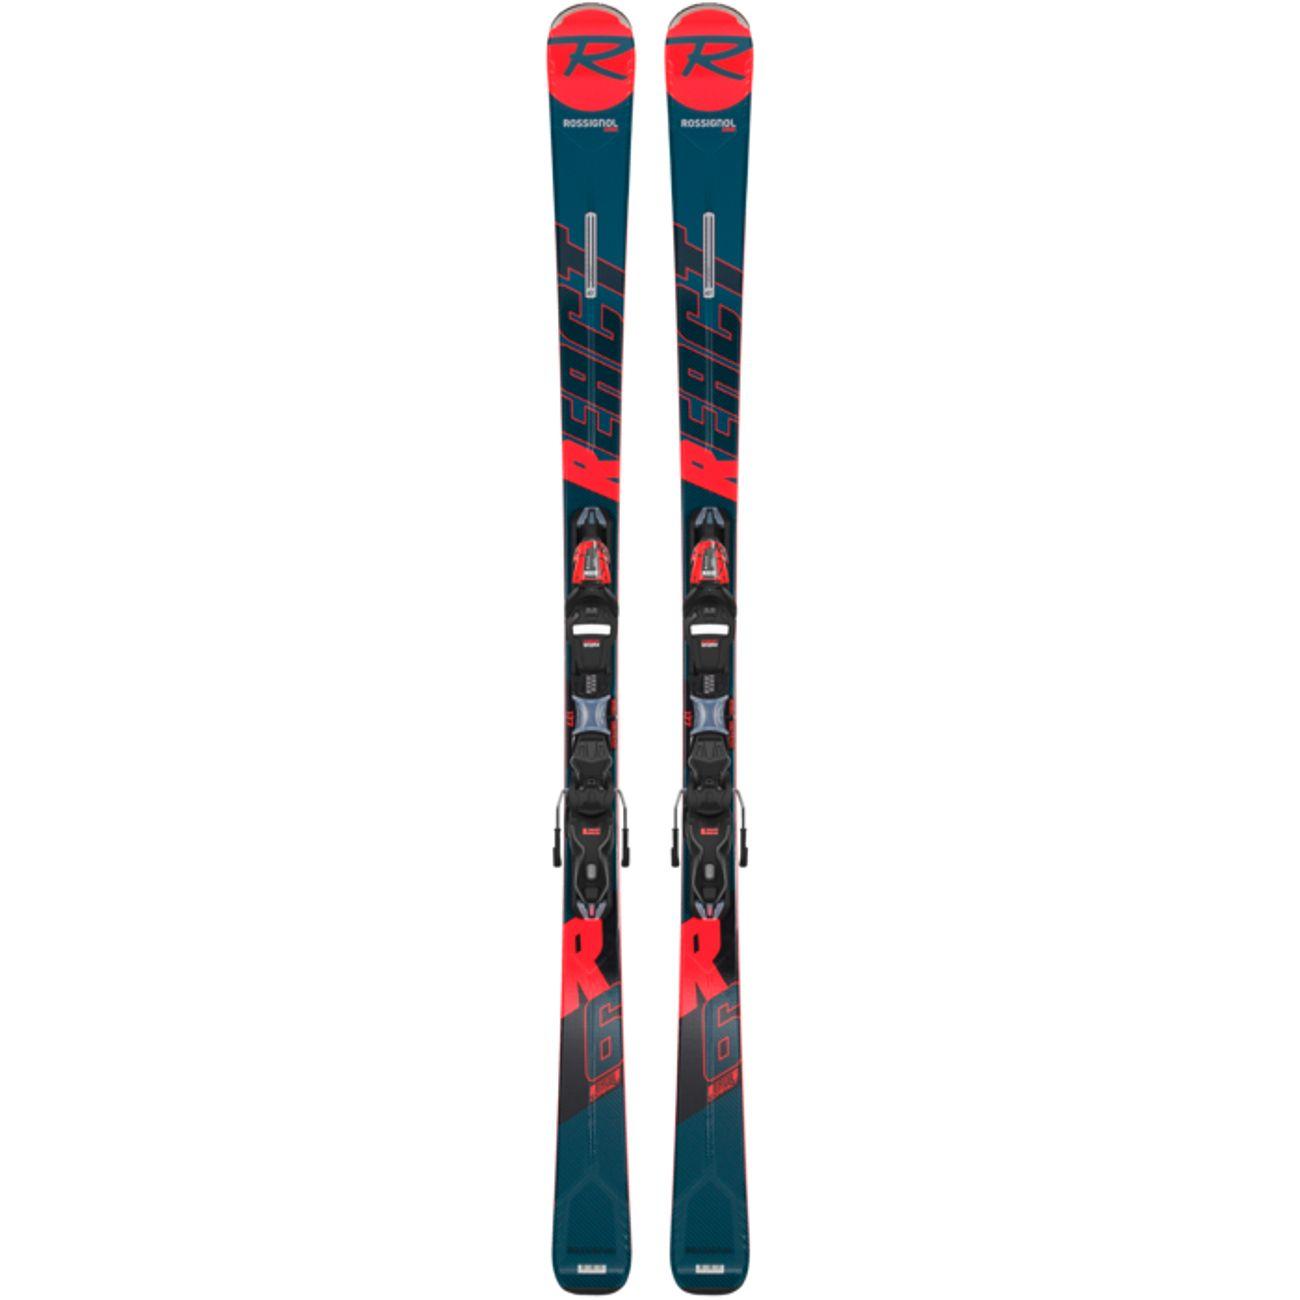 SKIS Ski adulte ROSSIGNOL REACT R6 COMPACT XPRESS 11 GW B83 B